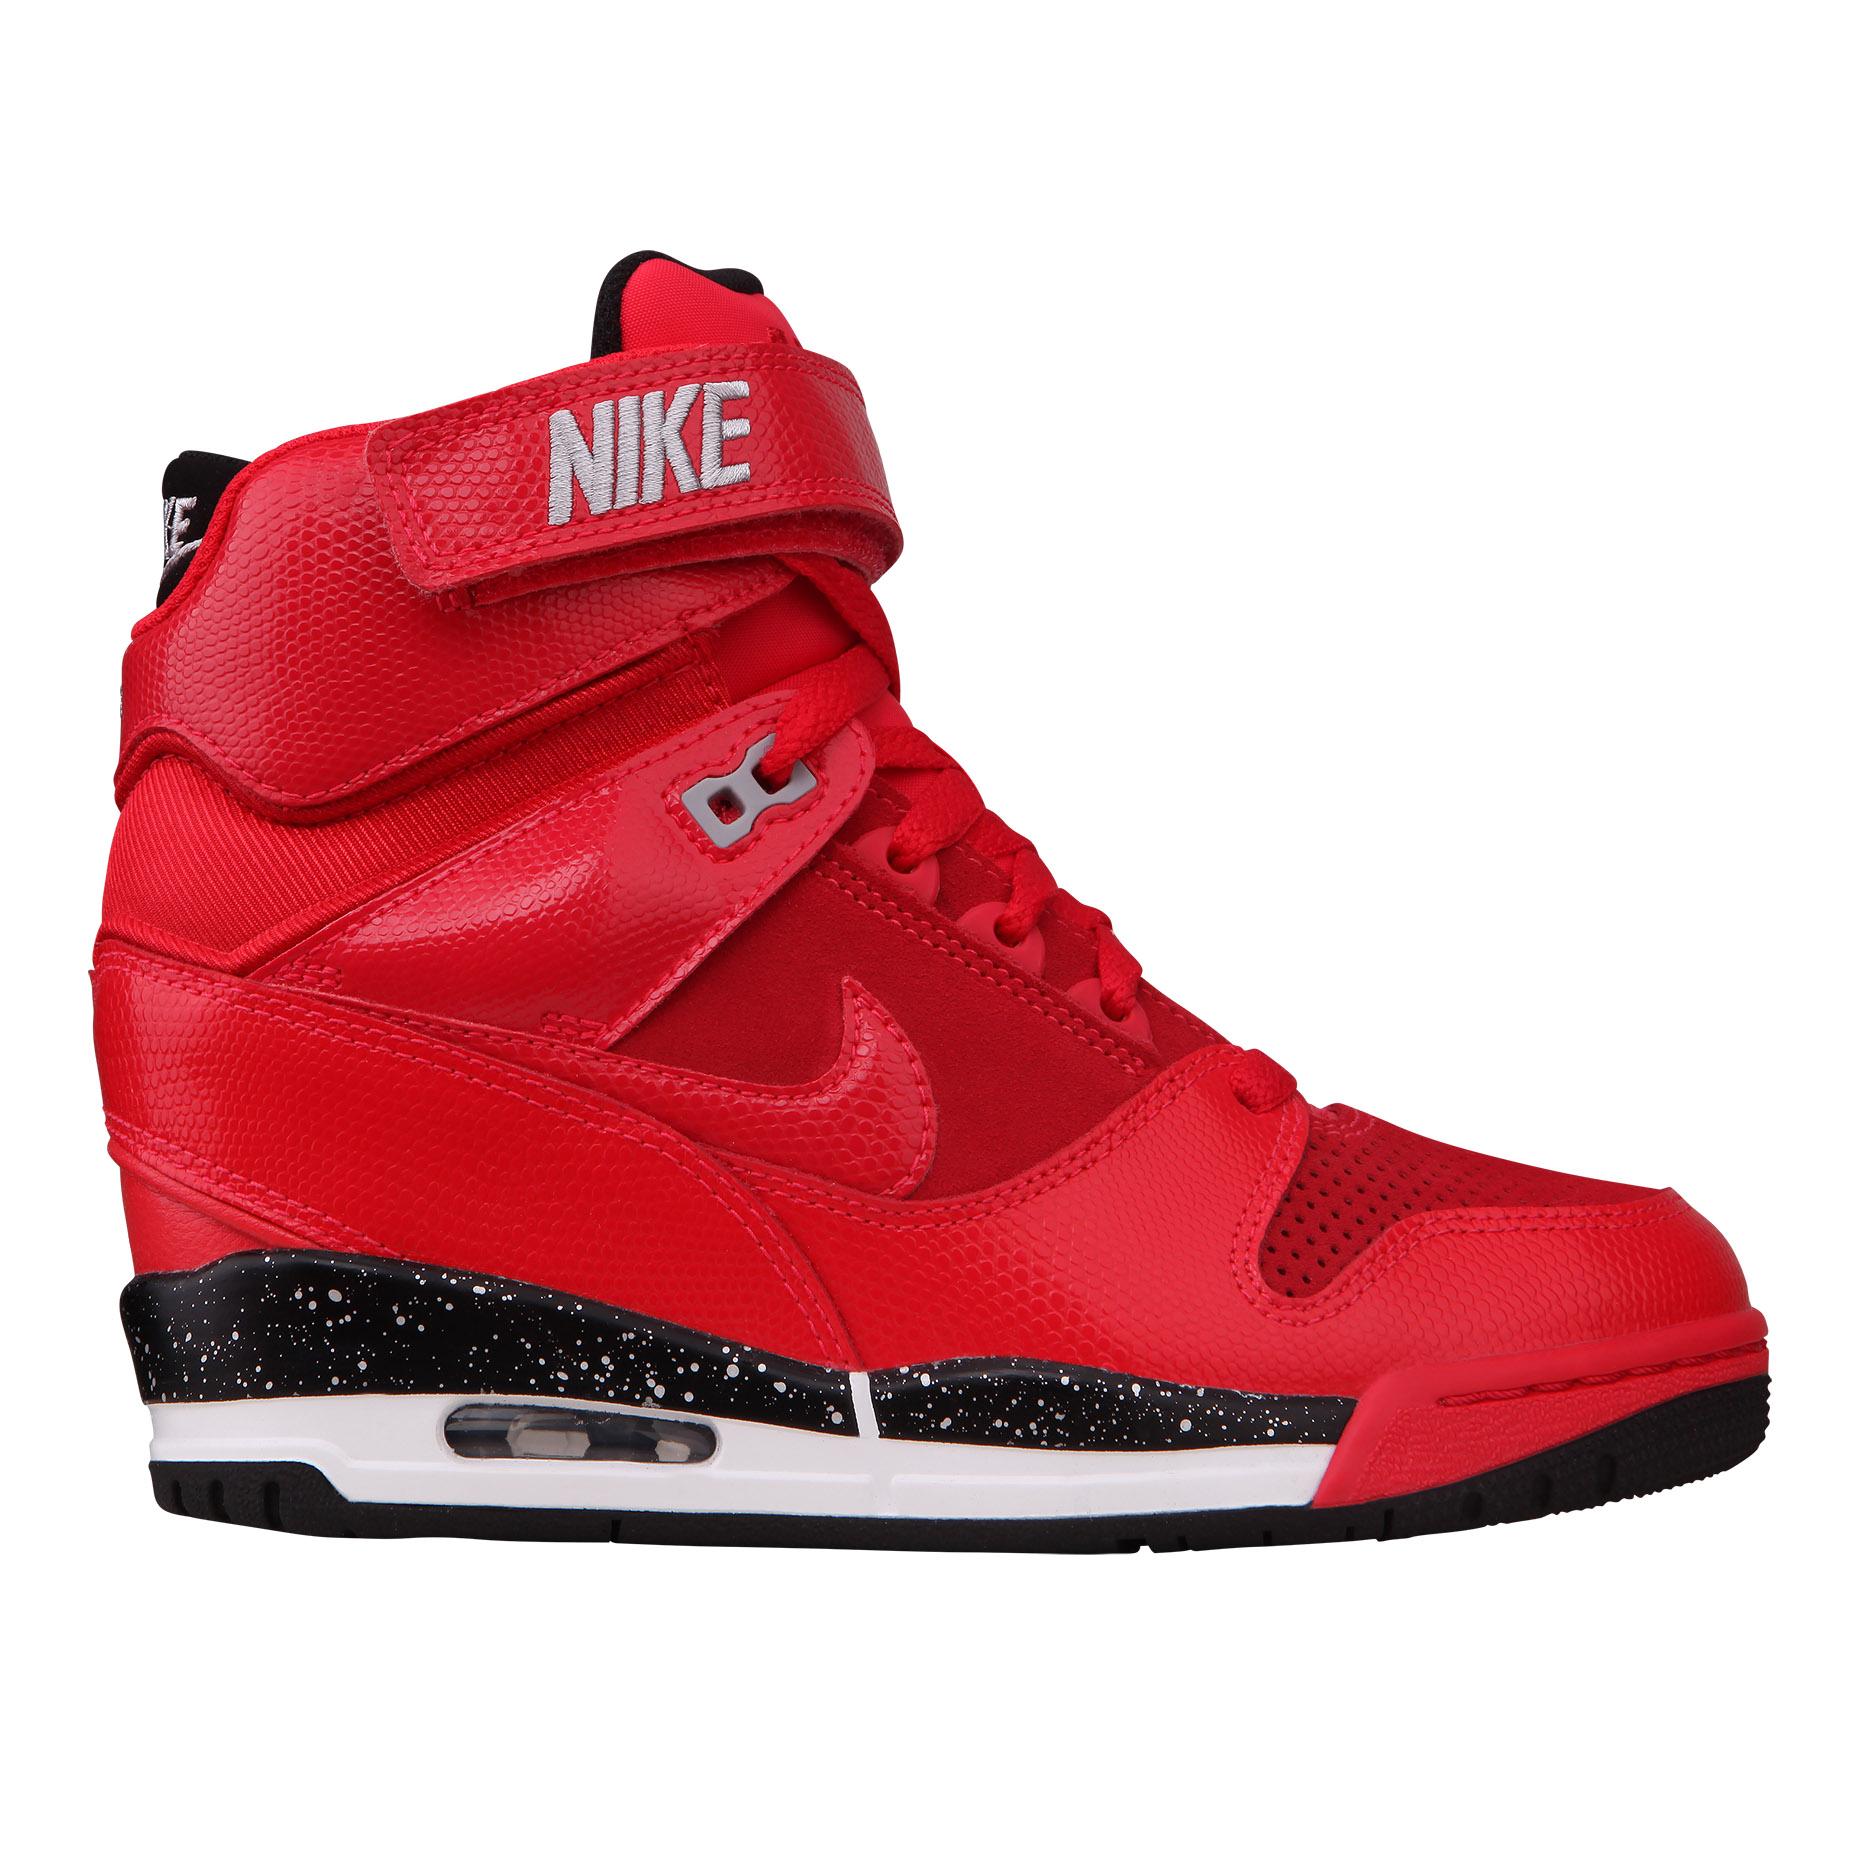 Nike Nike Official NIKE AIR REVOLUTION SKY HI 599410 women's